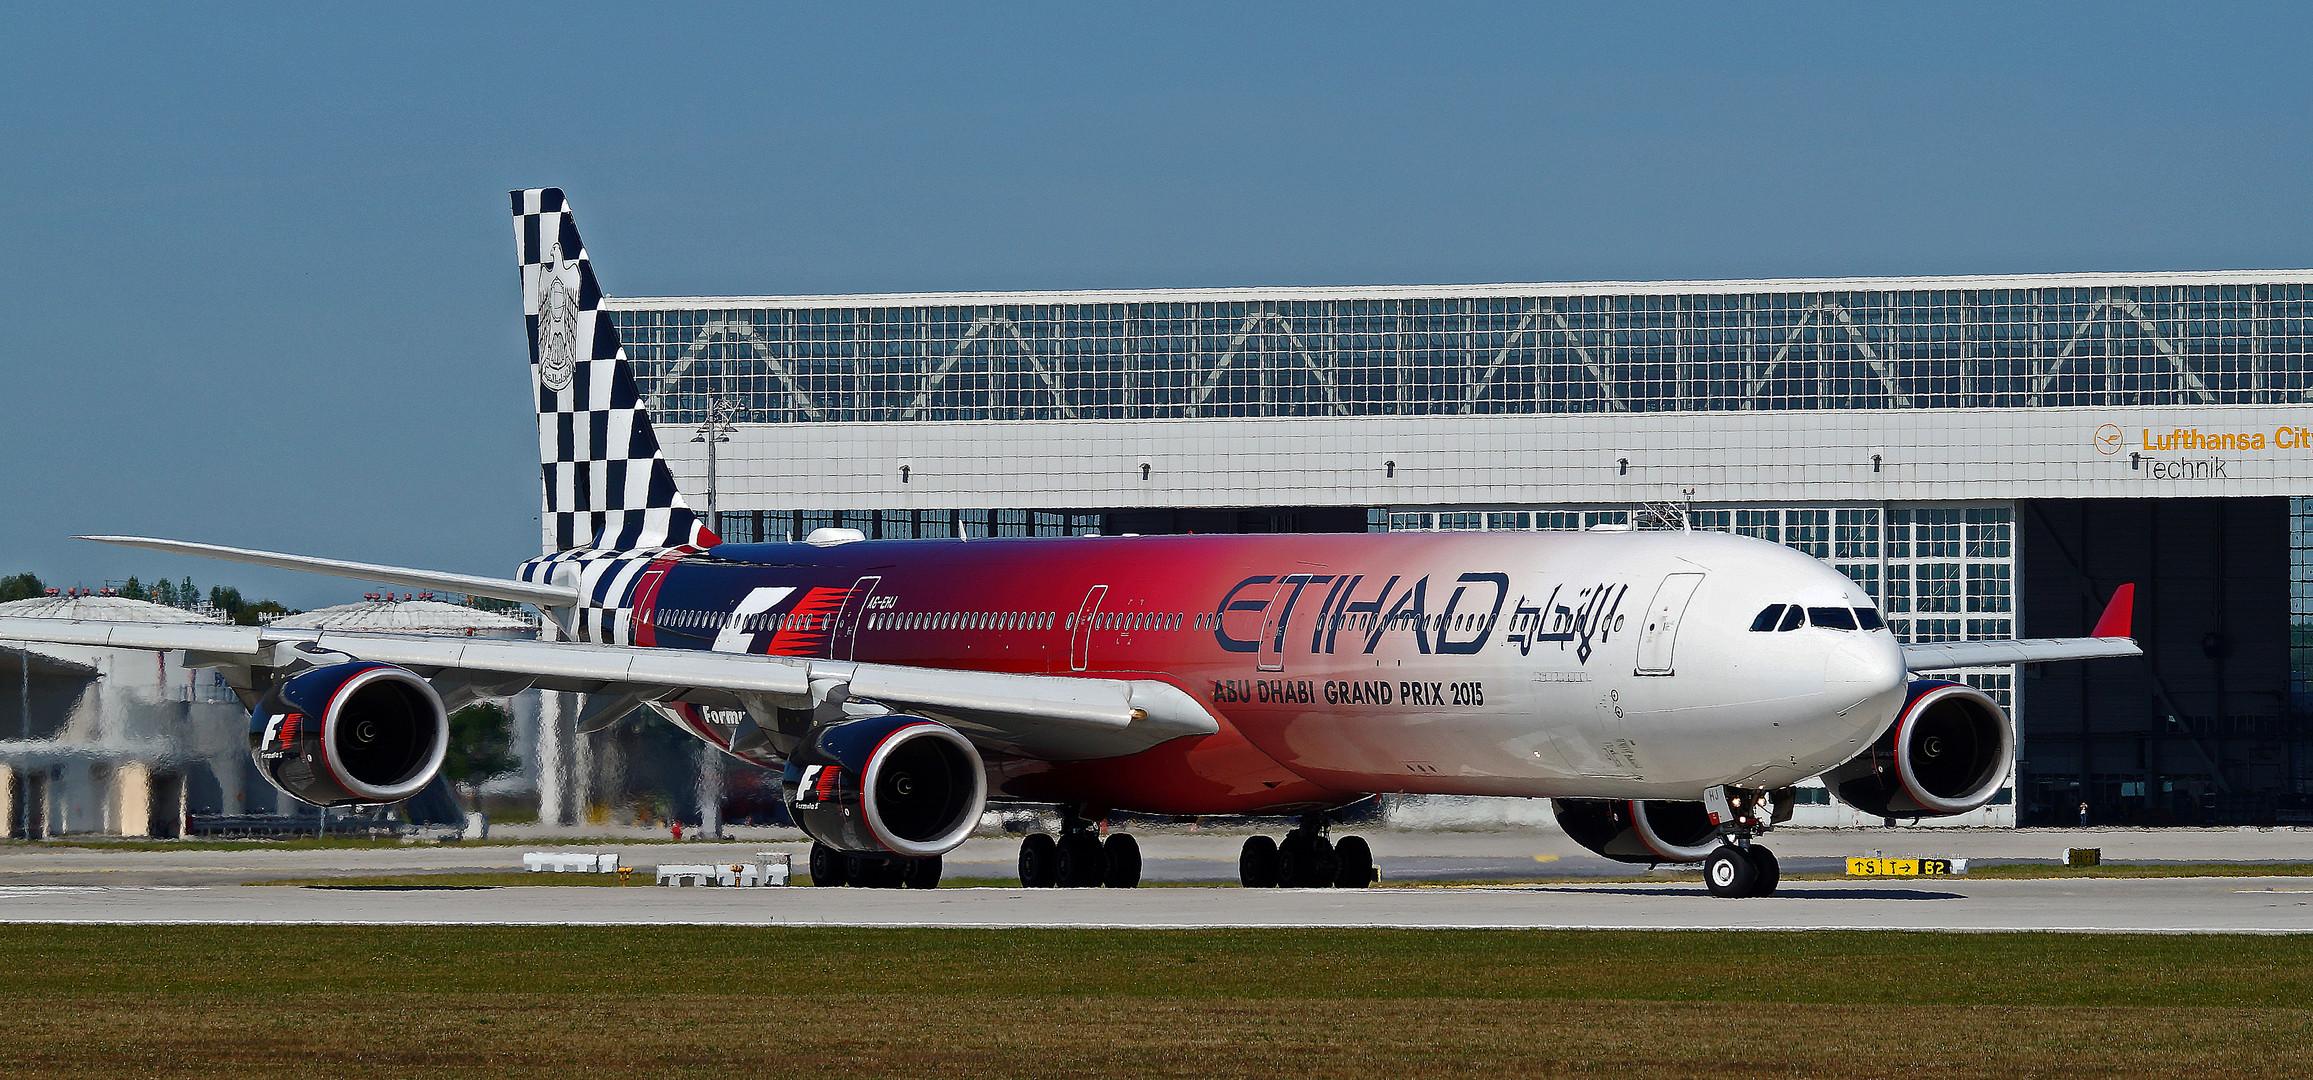 ETIHAD AIRWAYS / Formula One Livery